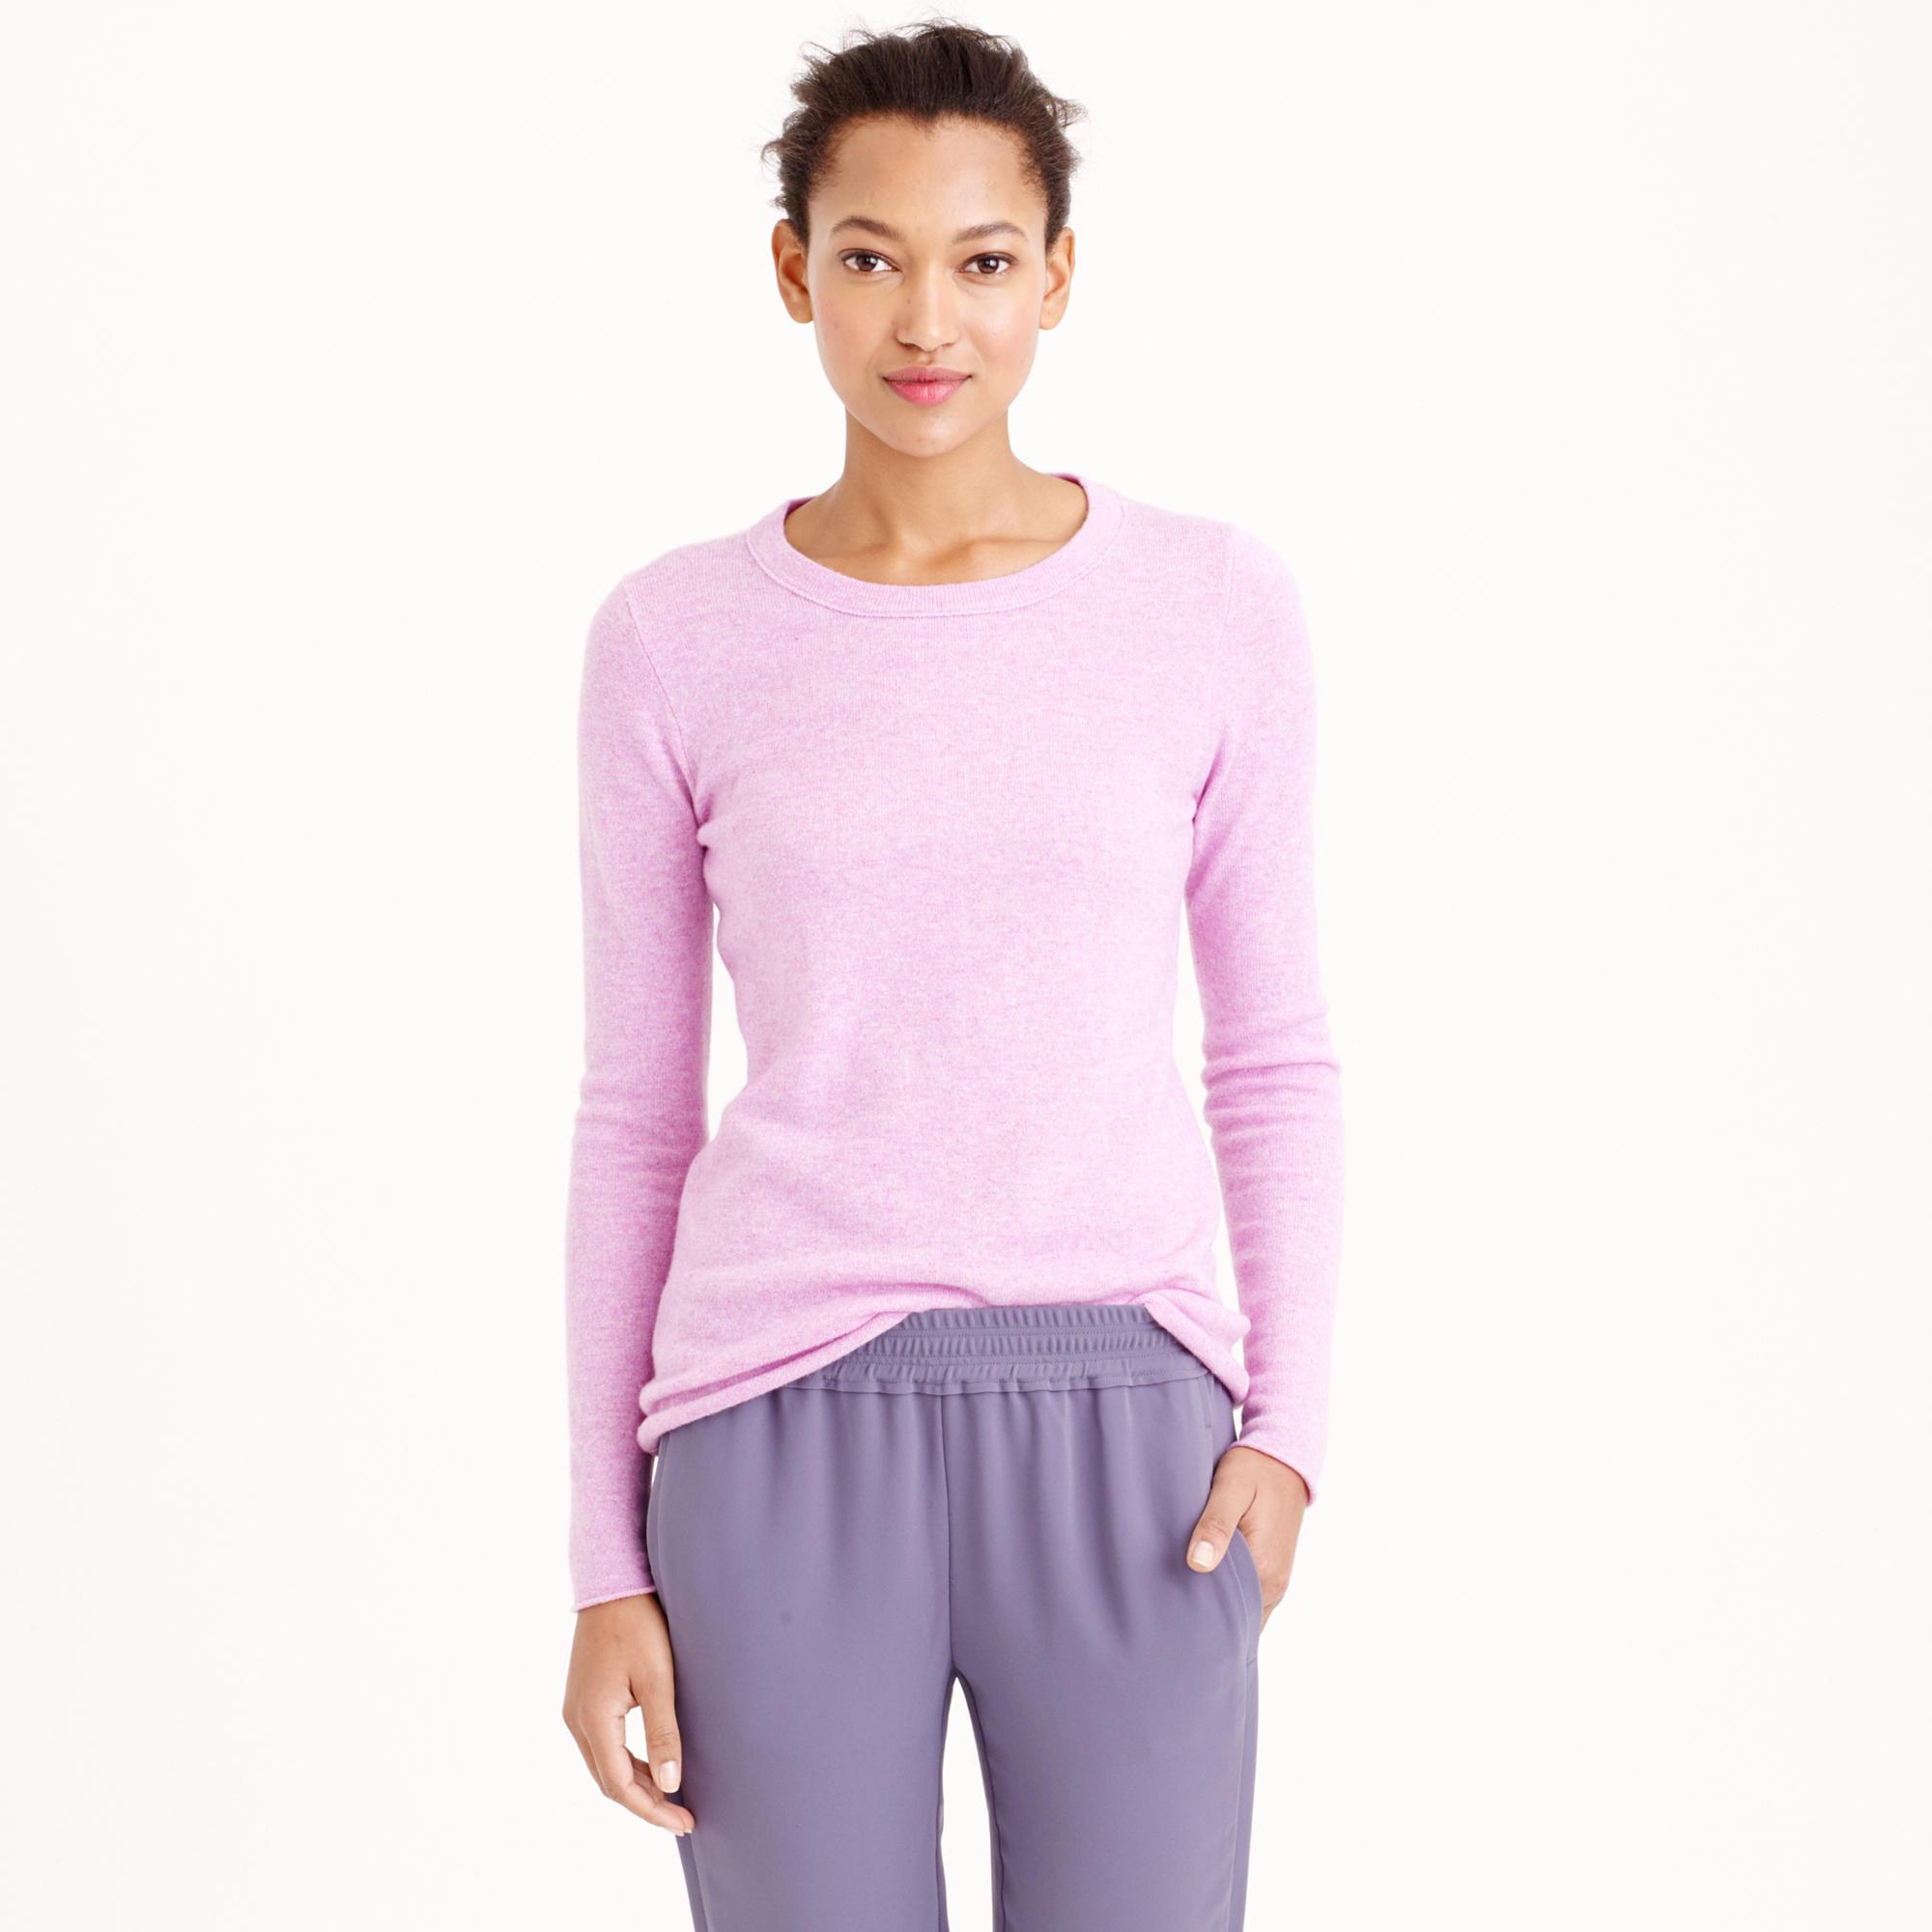 Italian cashmere long-sleeve T-shirt : Women cashmere | Factory